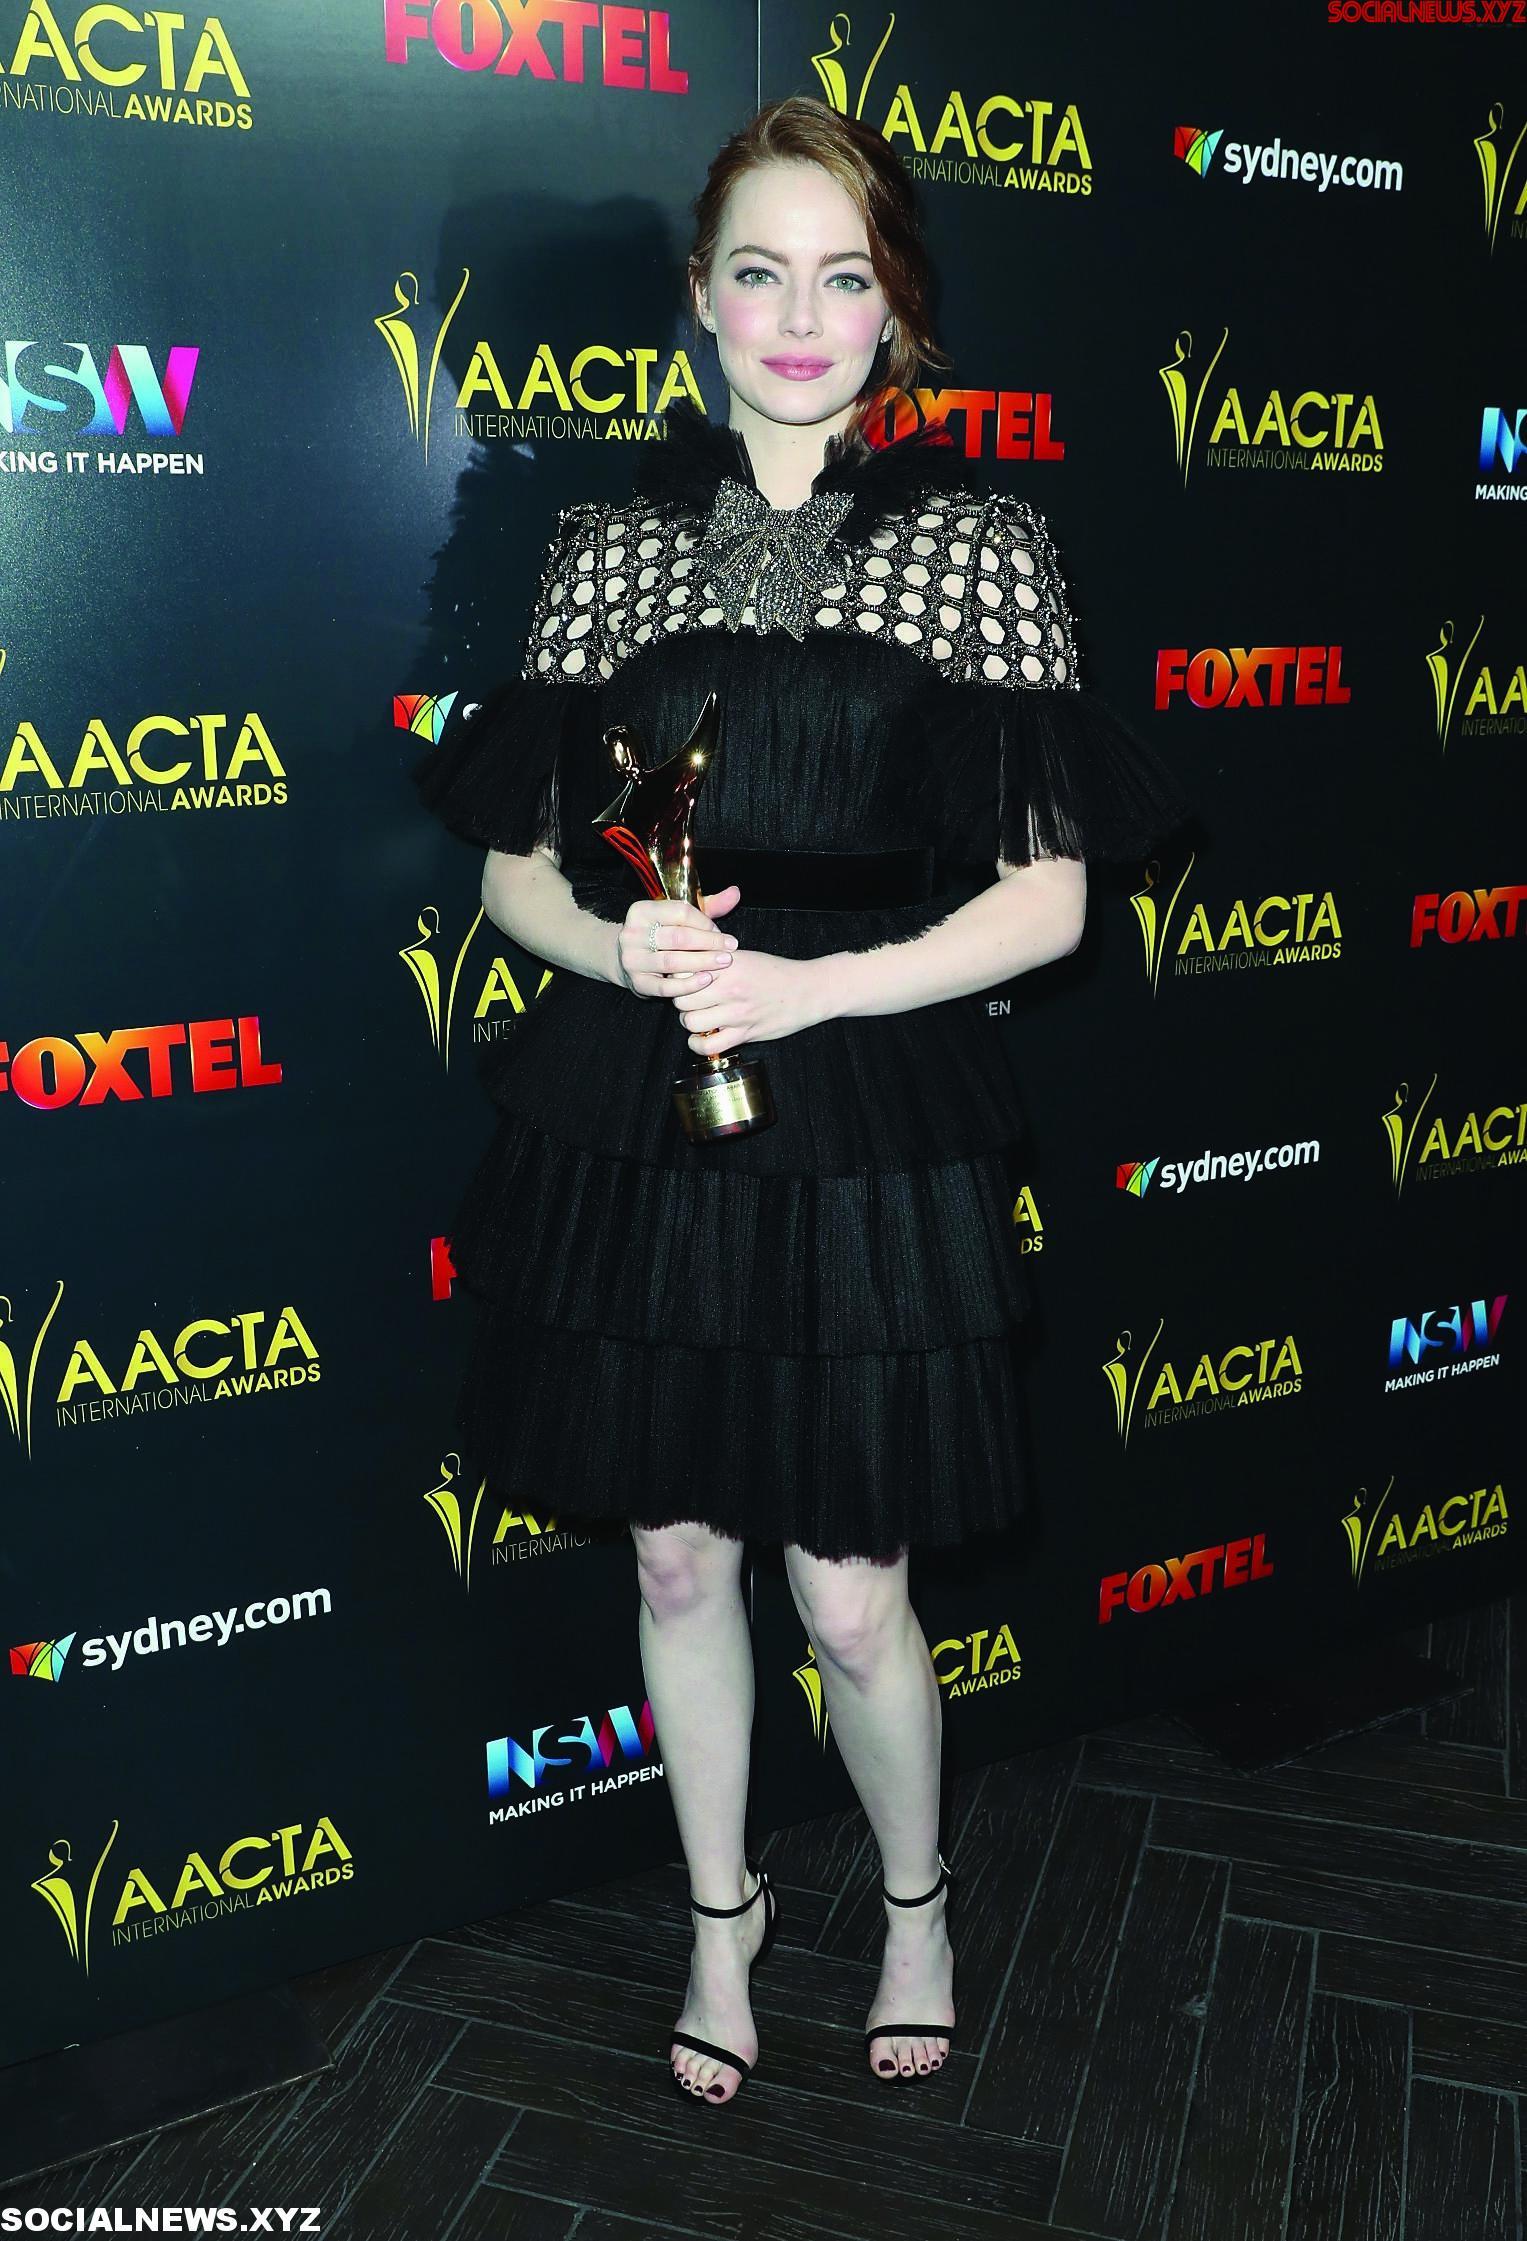 6th ACCTA International Awards Media Room Gallery